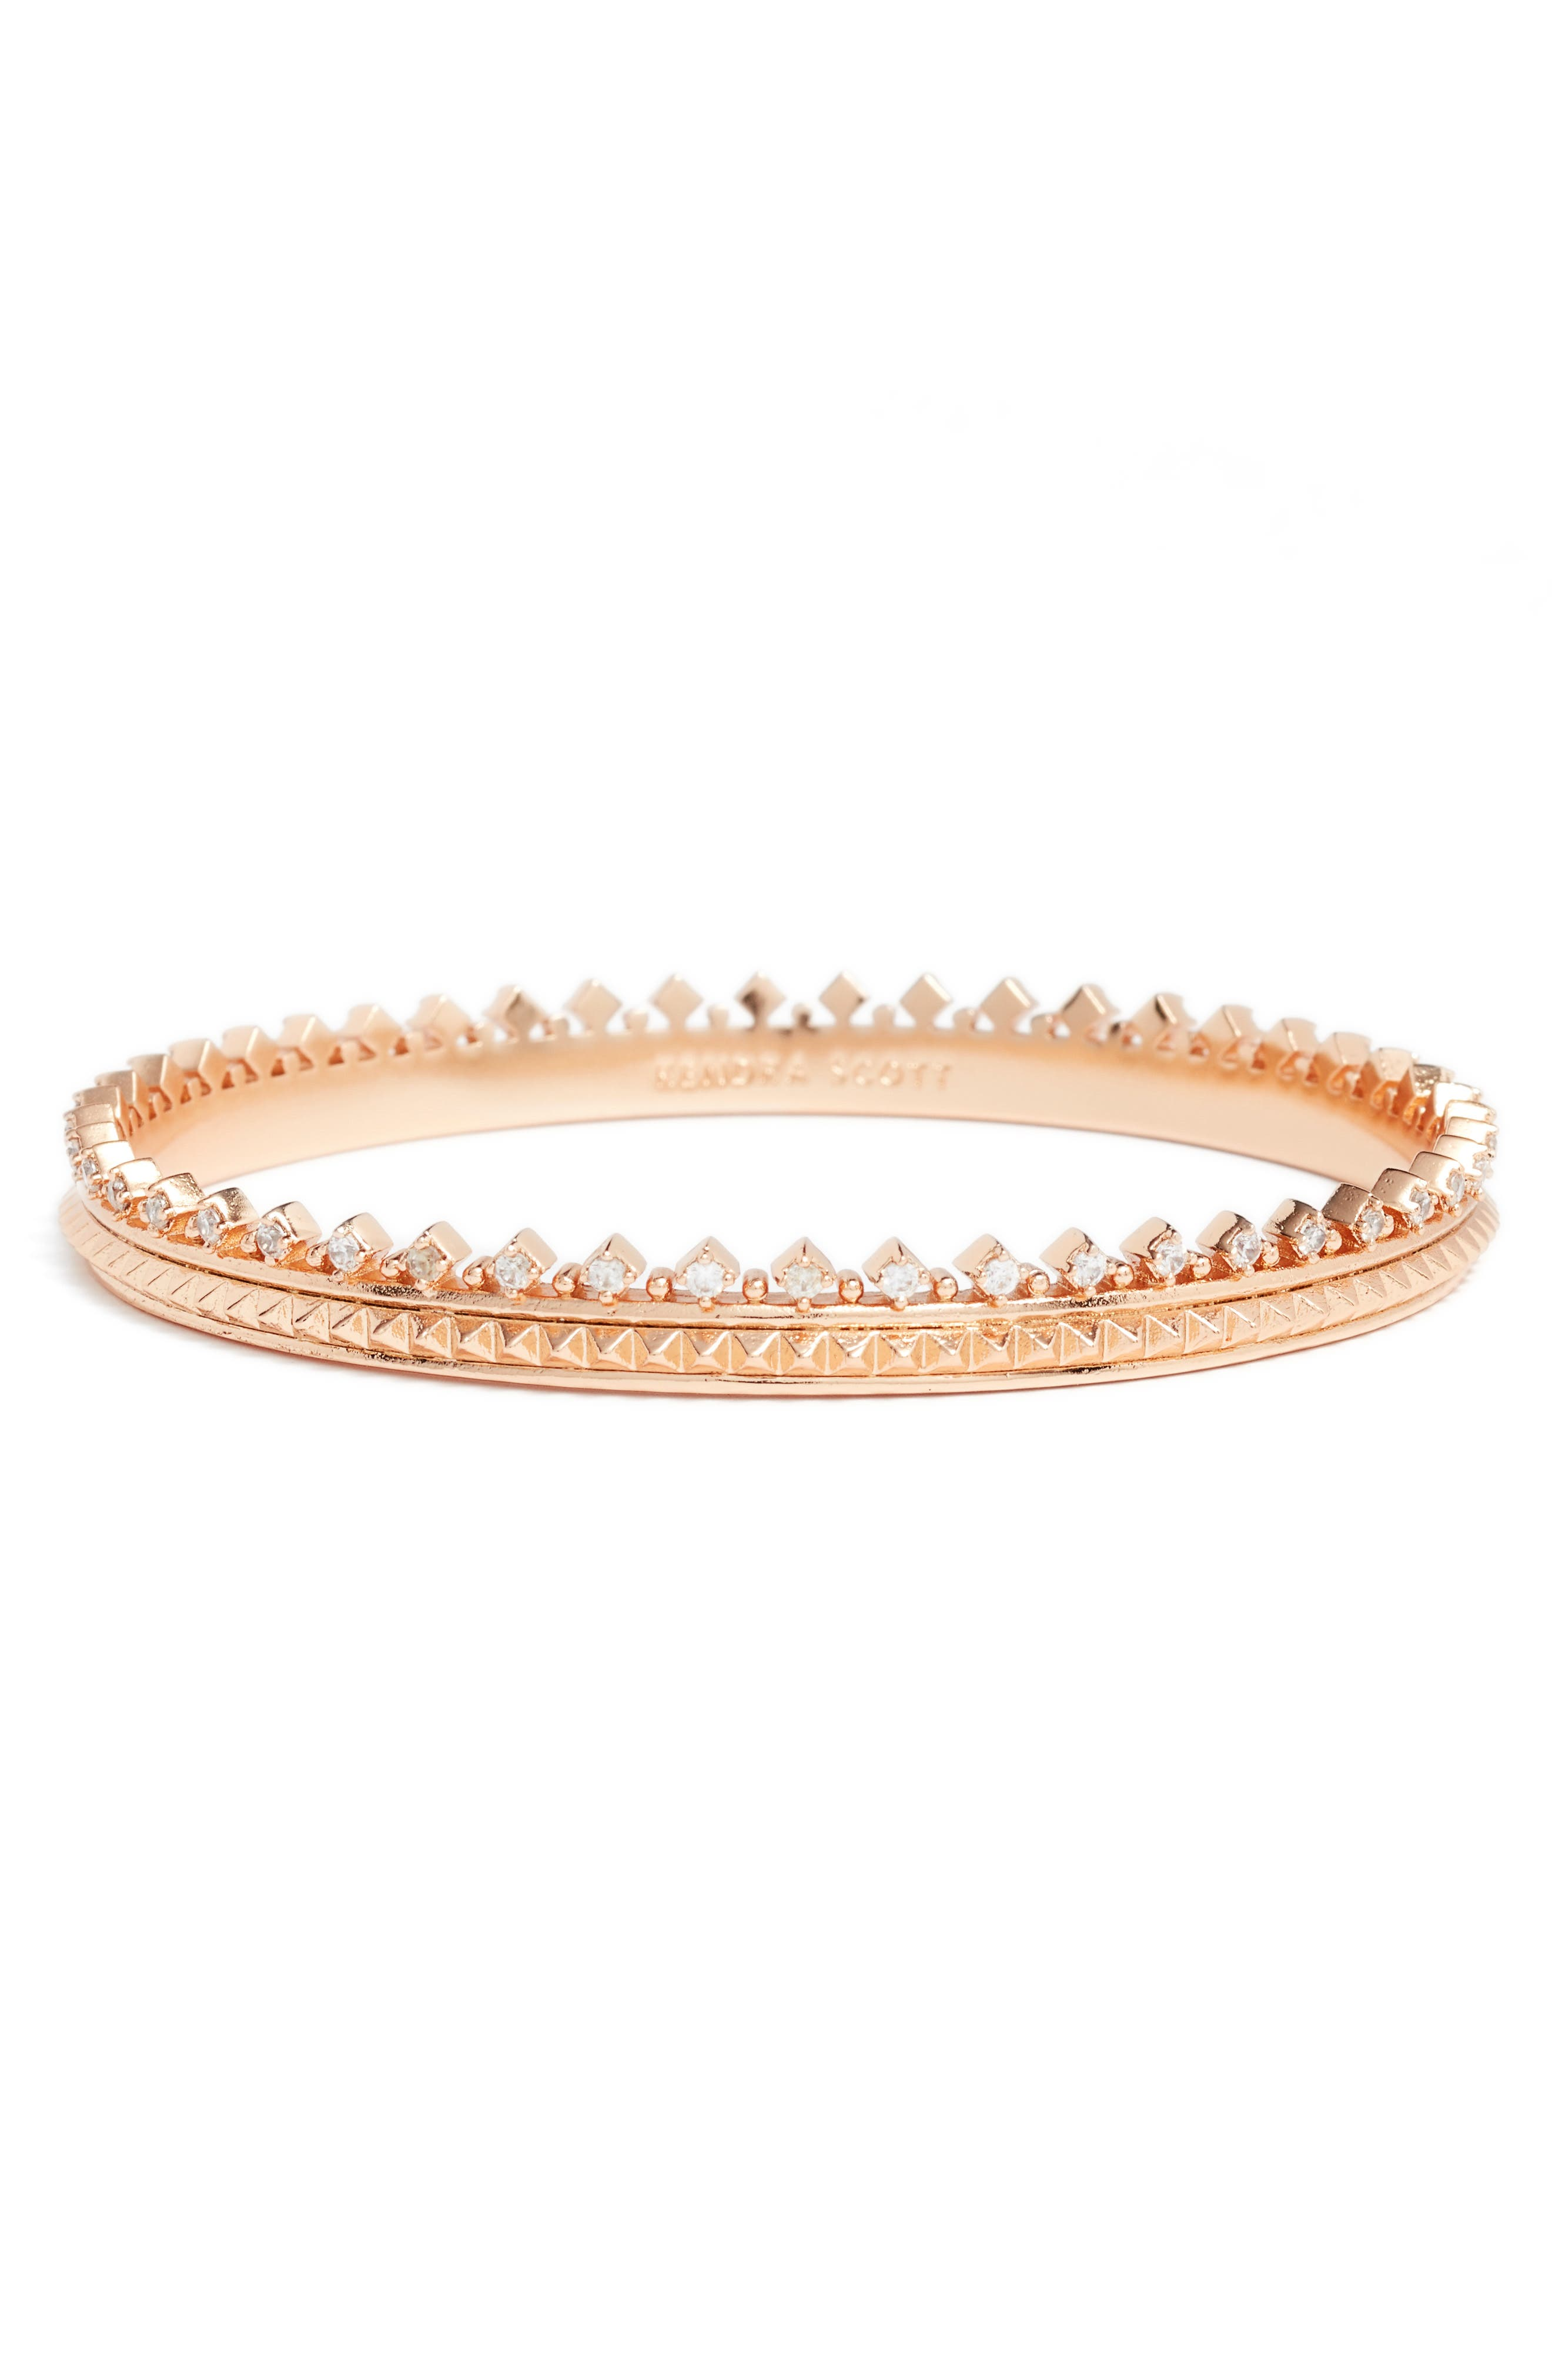 Mary Caroline Crystal Pyramid Cuff Bracelet,                         Main,                         color, Rose Gold